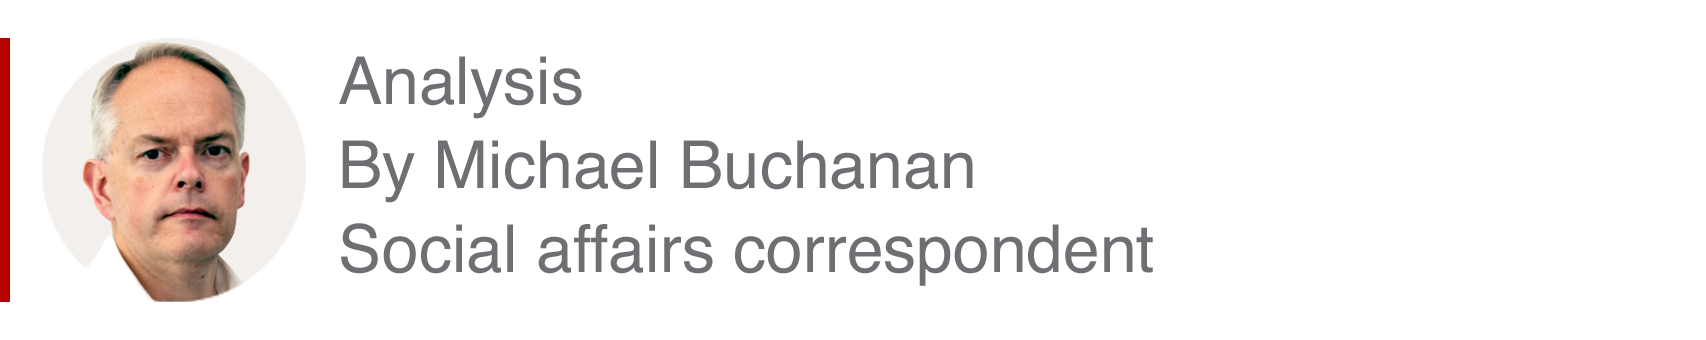 Analysis box by Michael Buchanan, social affairs correspondent